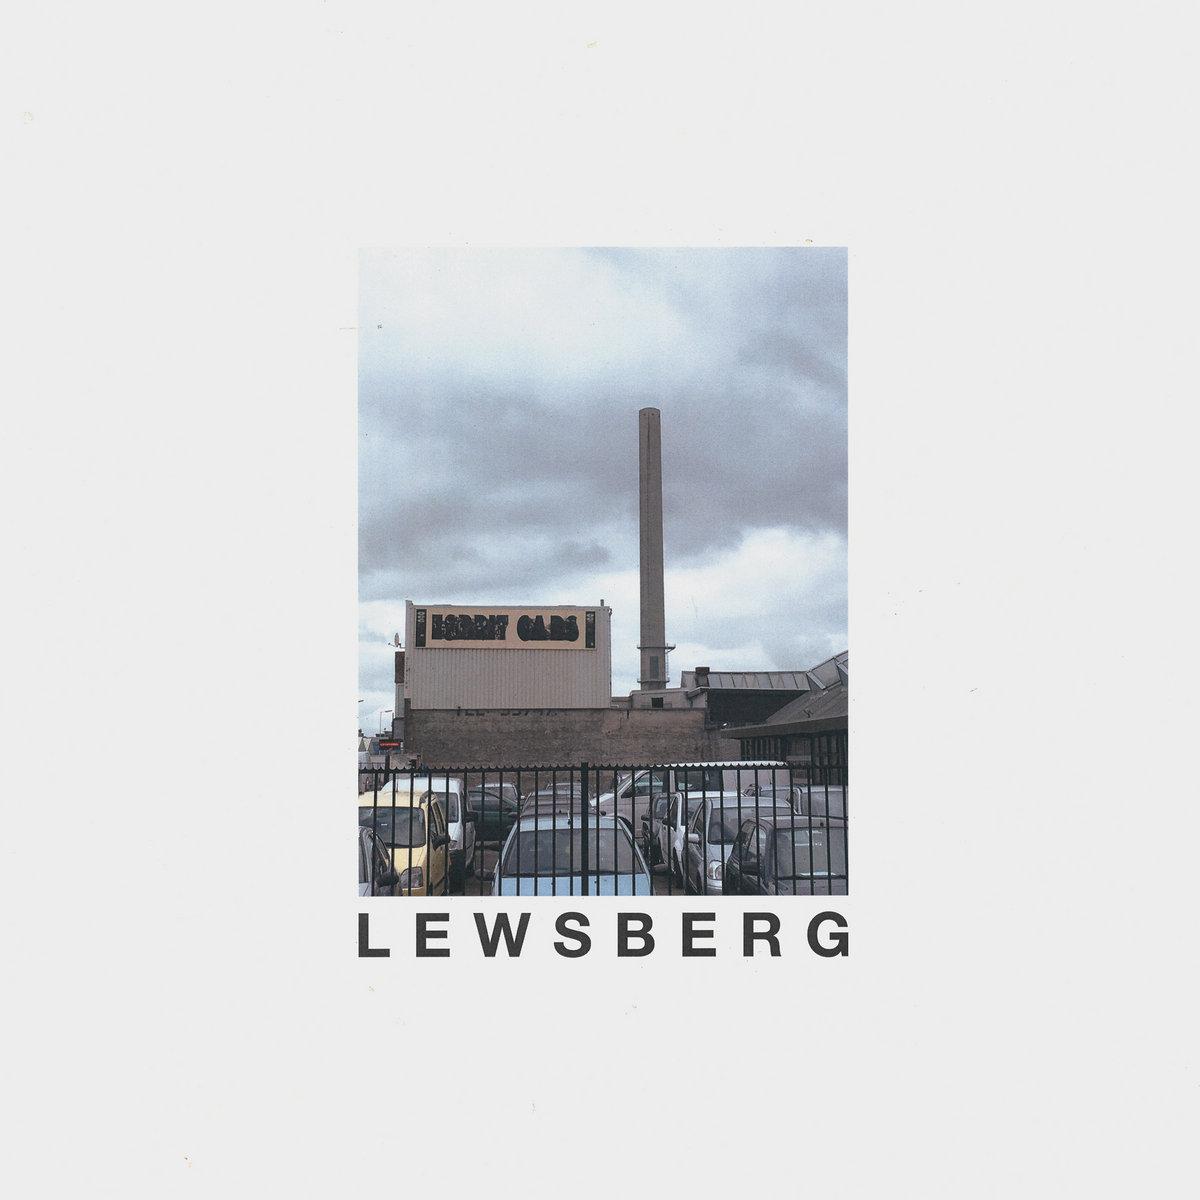 Lewsberg